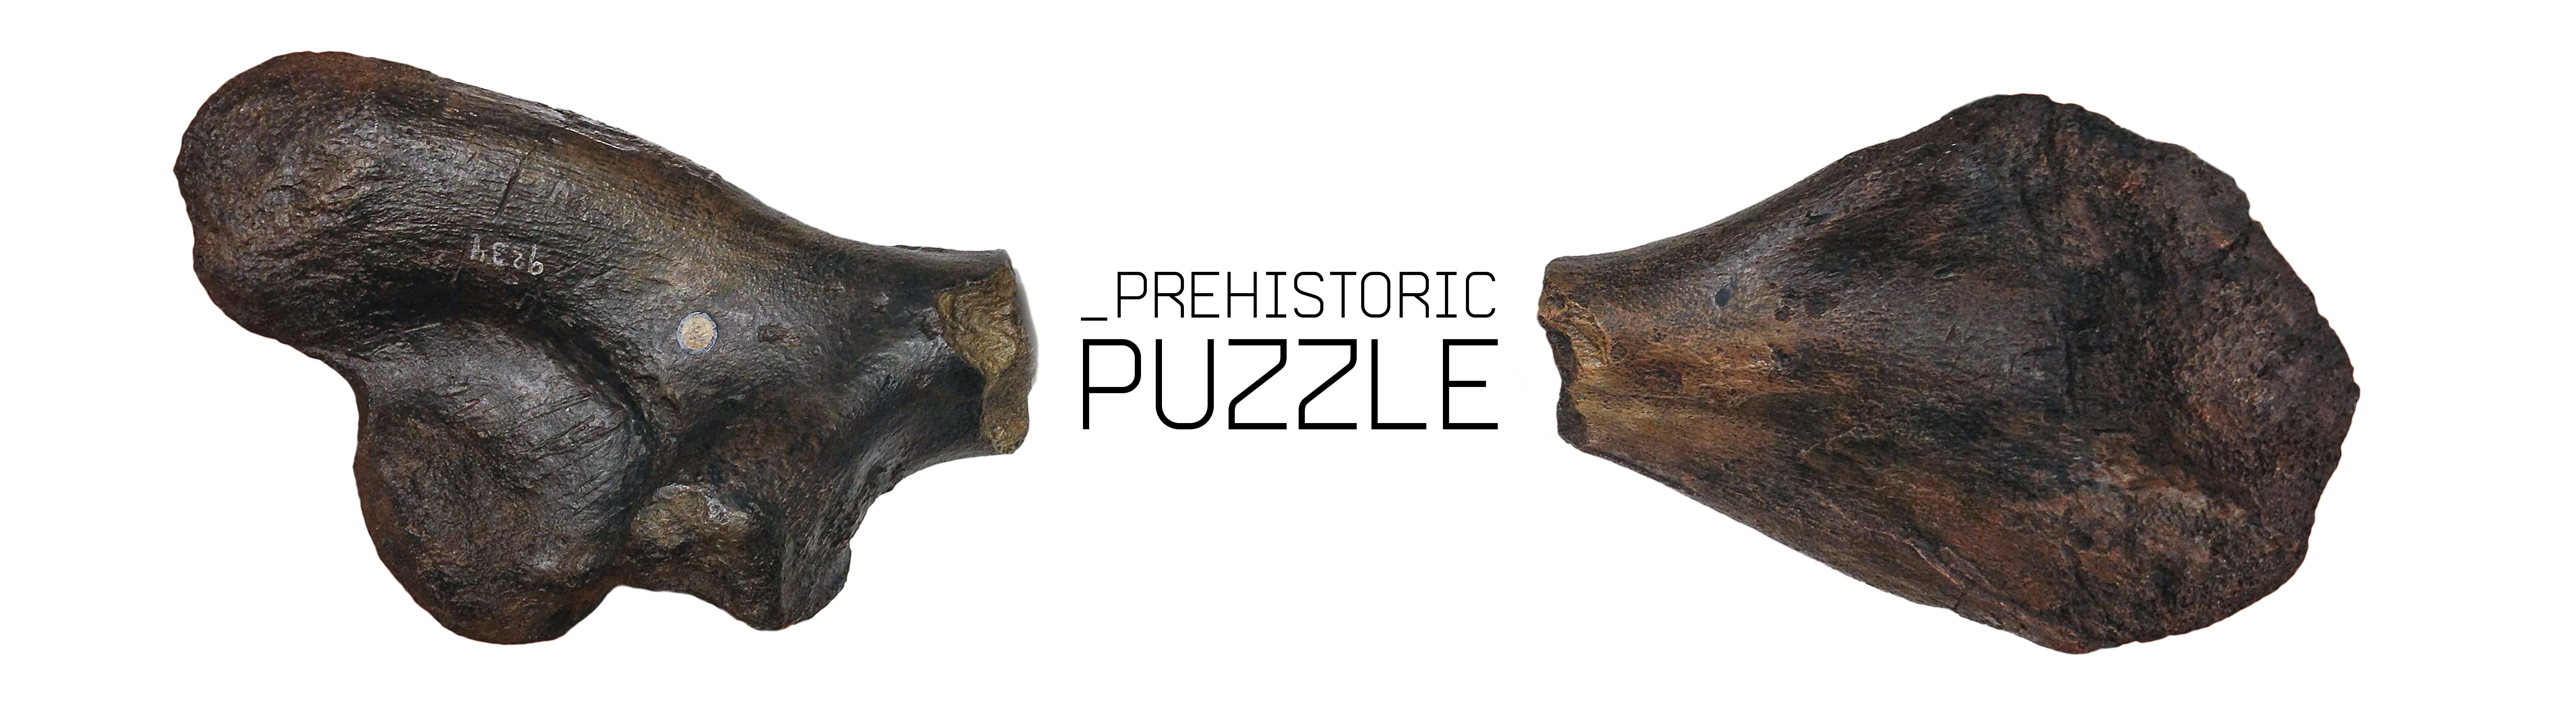 Prehistoric Puzzle